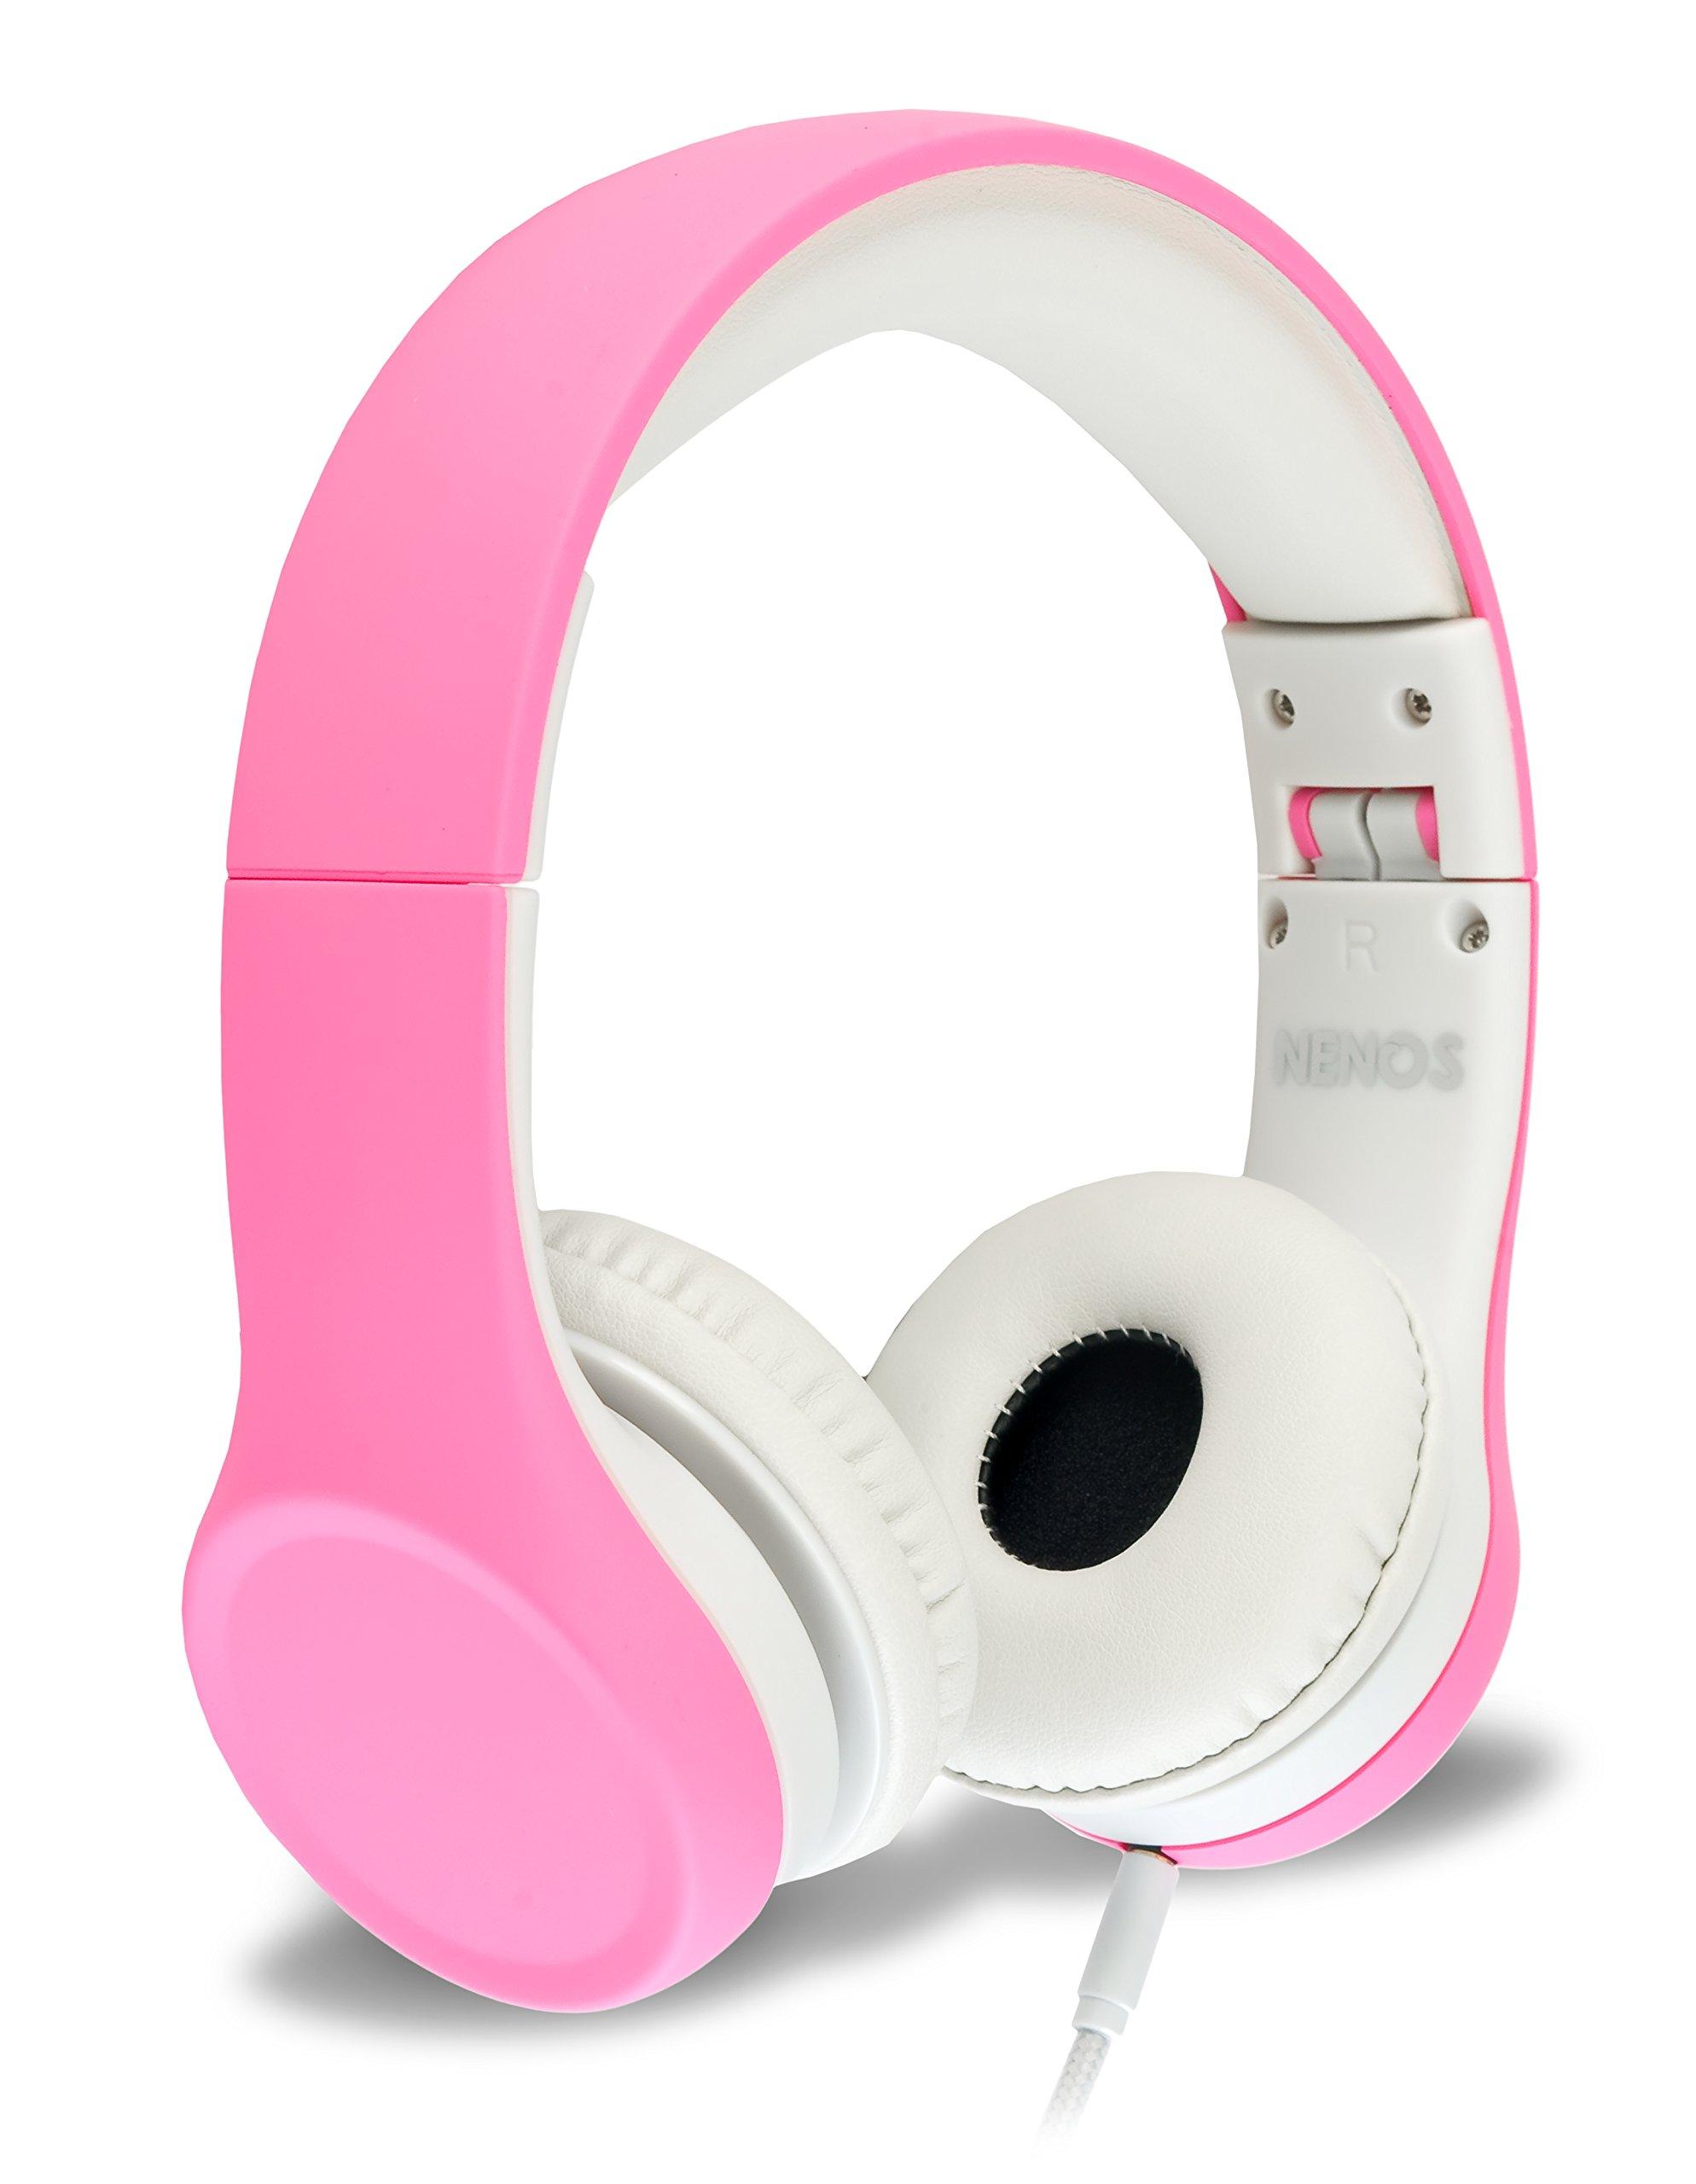 Nenos Children Headphones Kids Headphones Children's Headphones Volume Limited Headphones for Kids Foldable (Pink) by Nenos